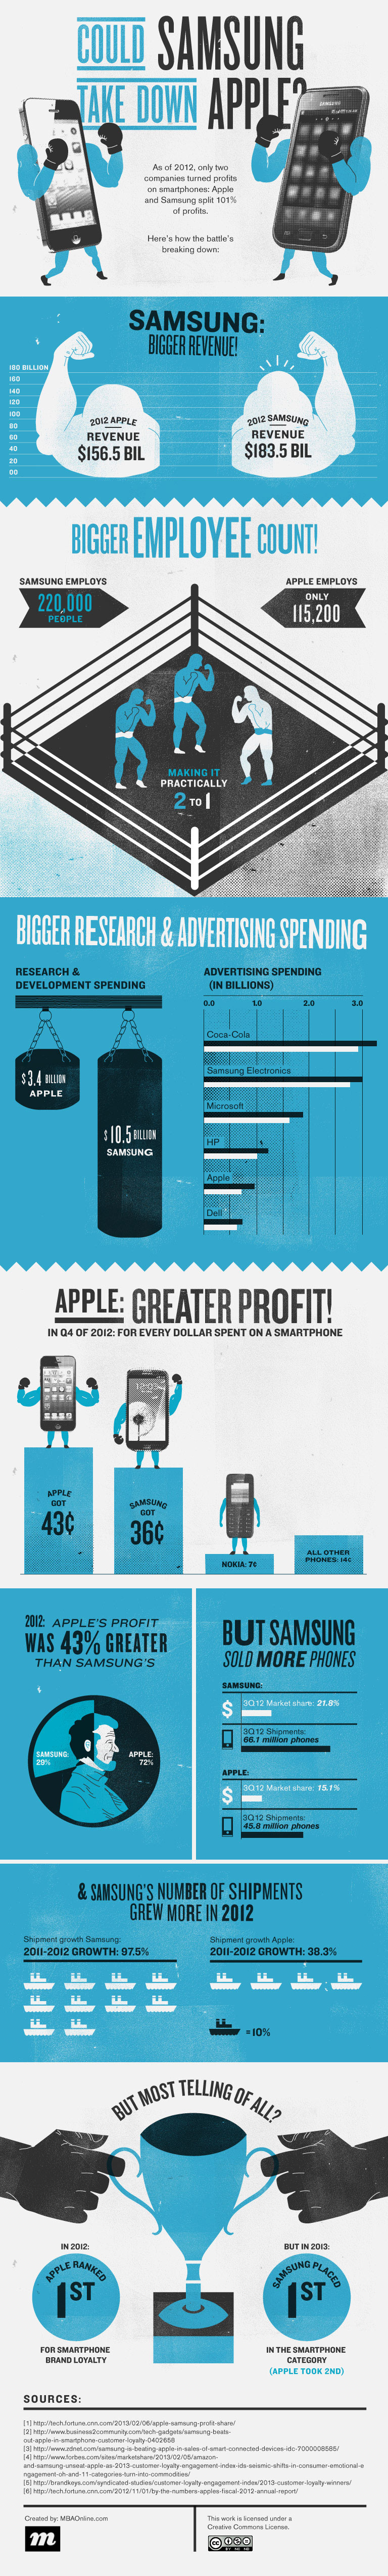 Samsung Apple Clash-Infographic